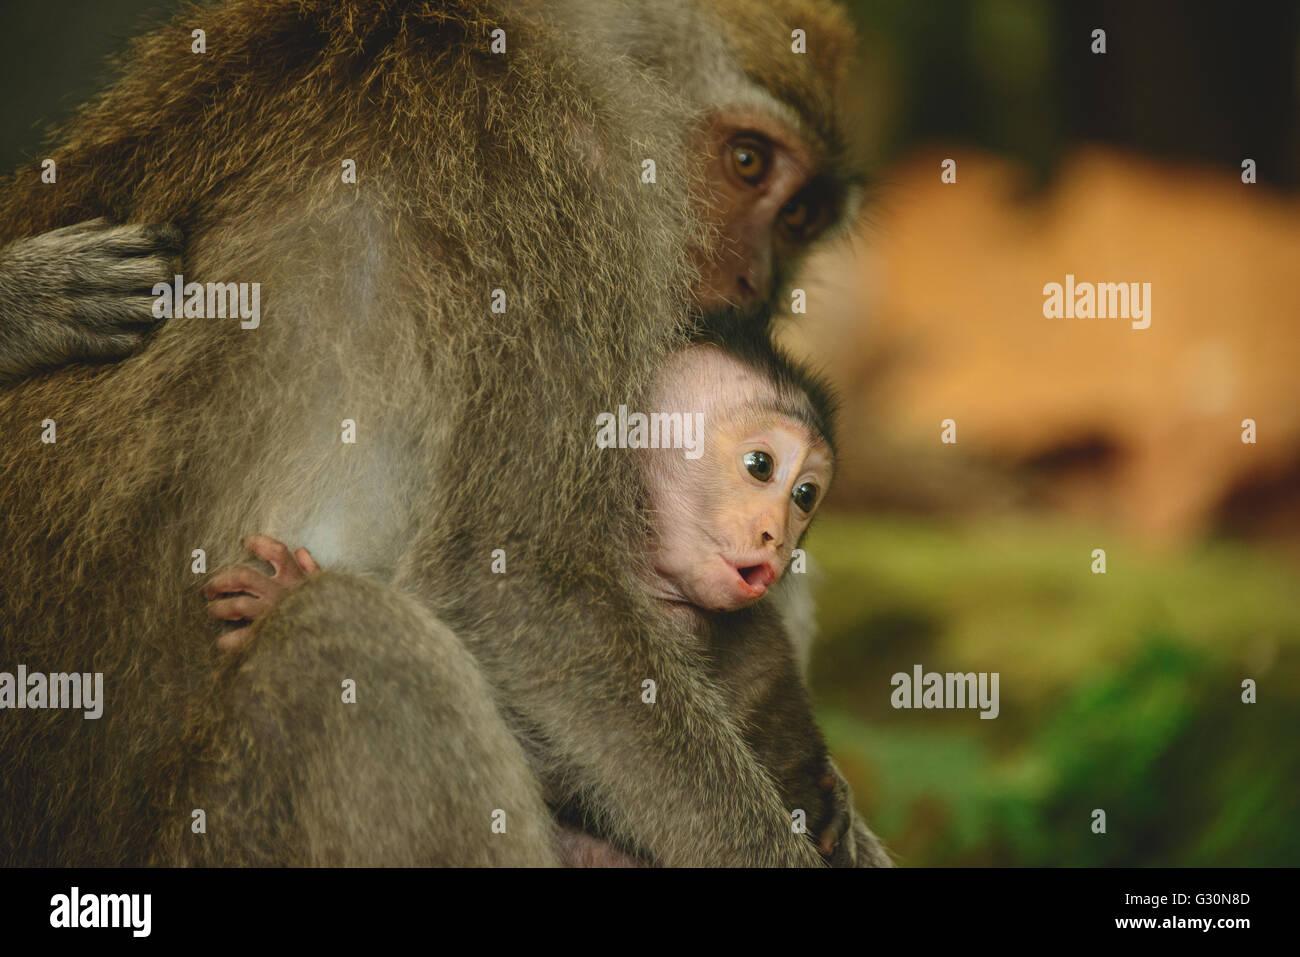 Baby monkey and family at the monkey forrest in Ubud, Bali - Stock Image